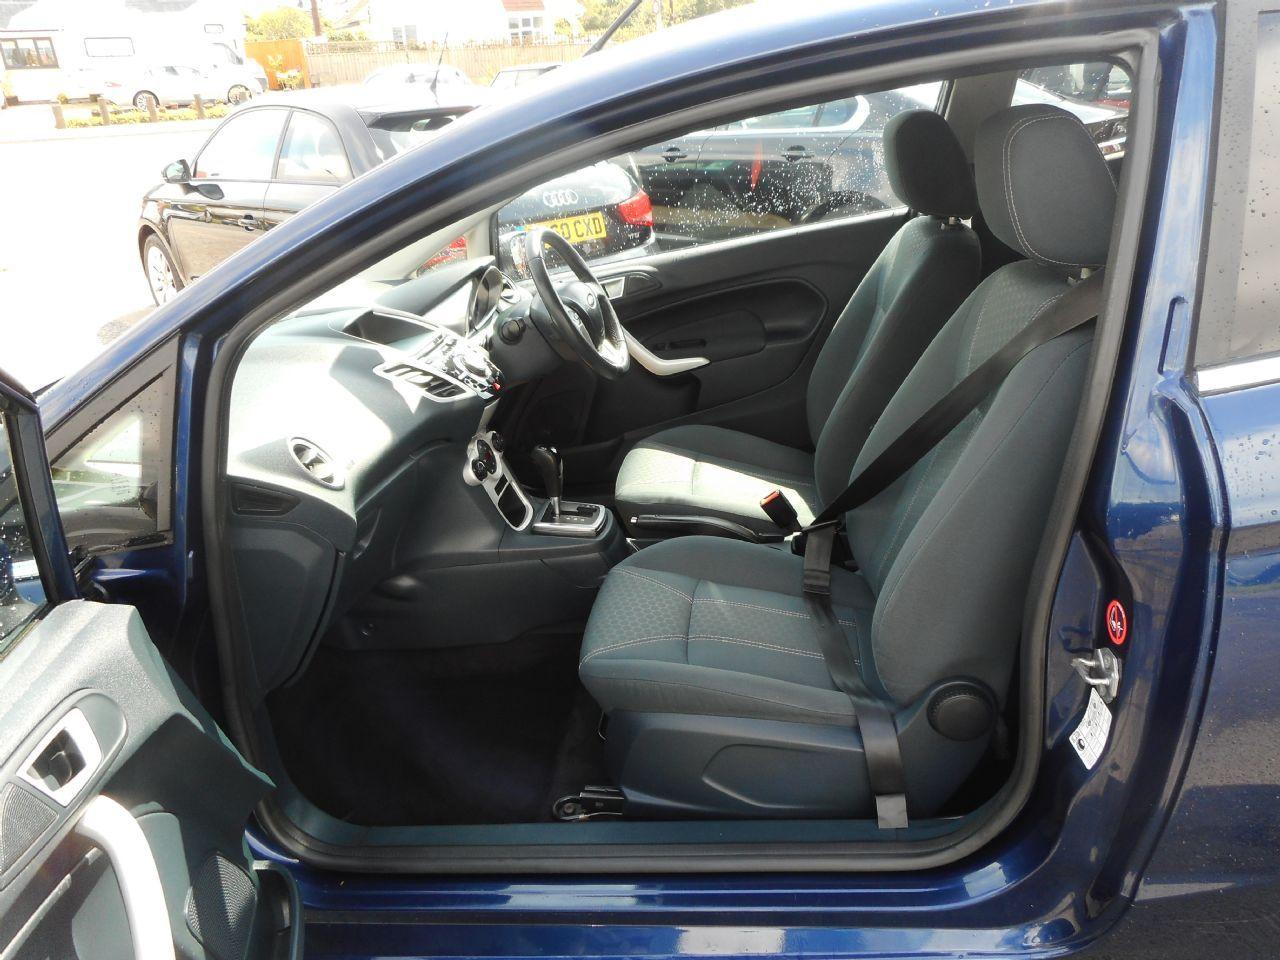 FORD Fiesta Titanium 1.4 096 Auto (2012) - Picture 9